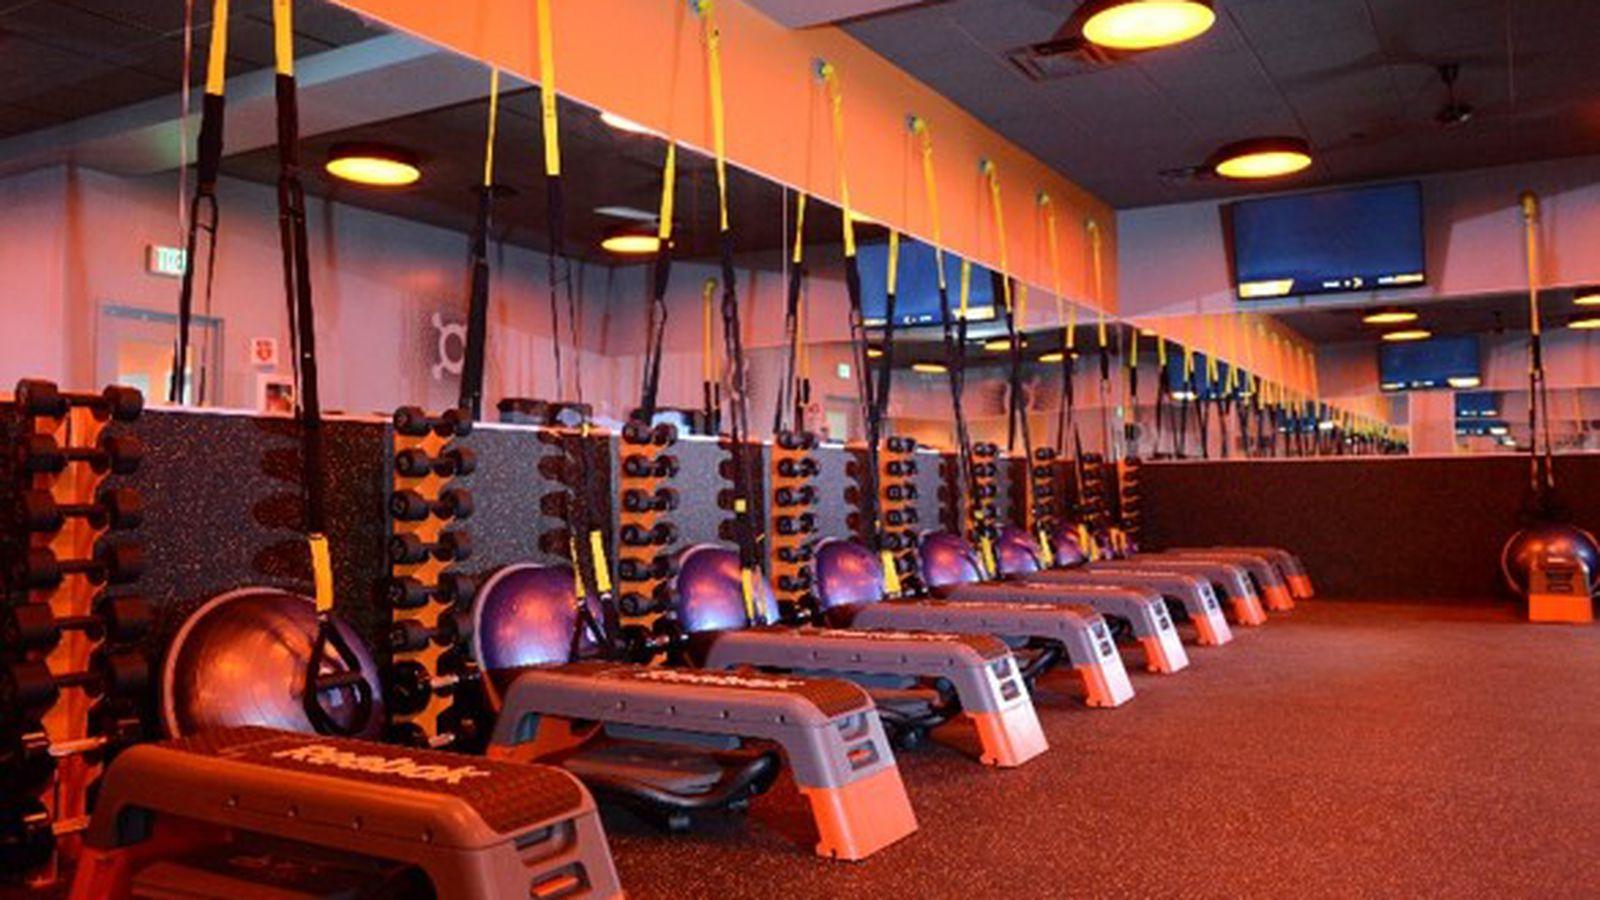 Three New Orangetheory Fitness Studios Will Open in ...